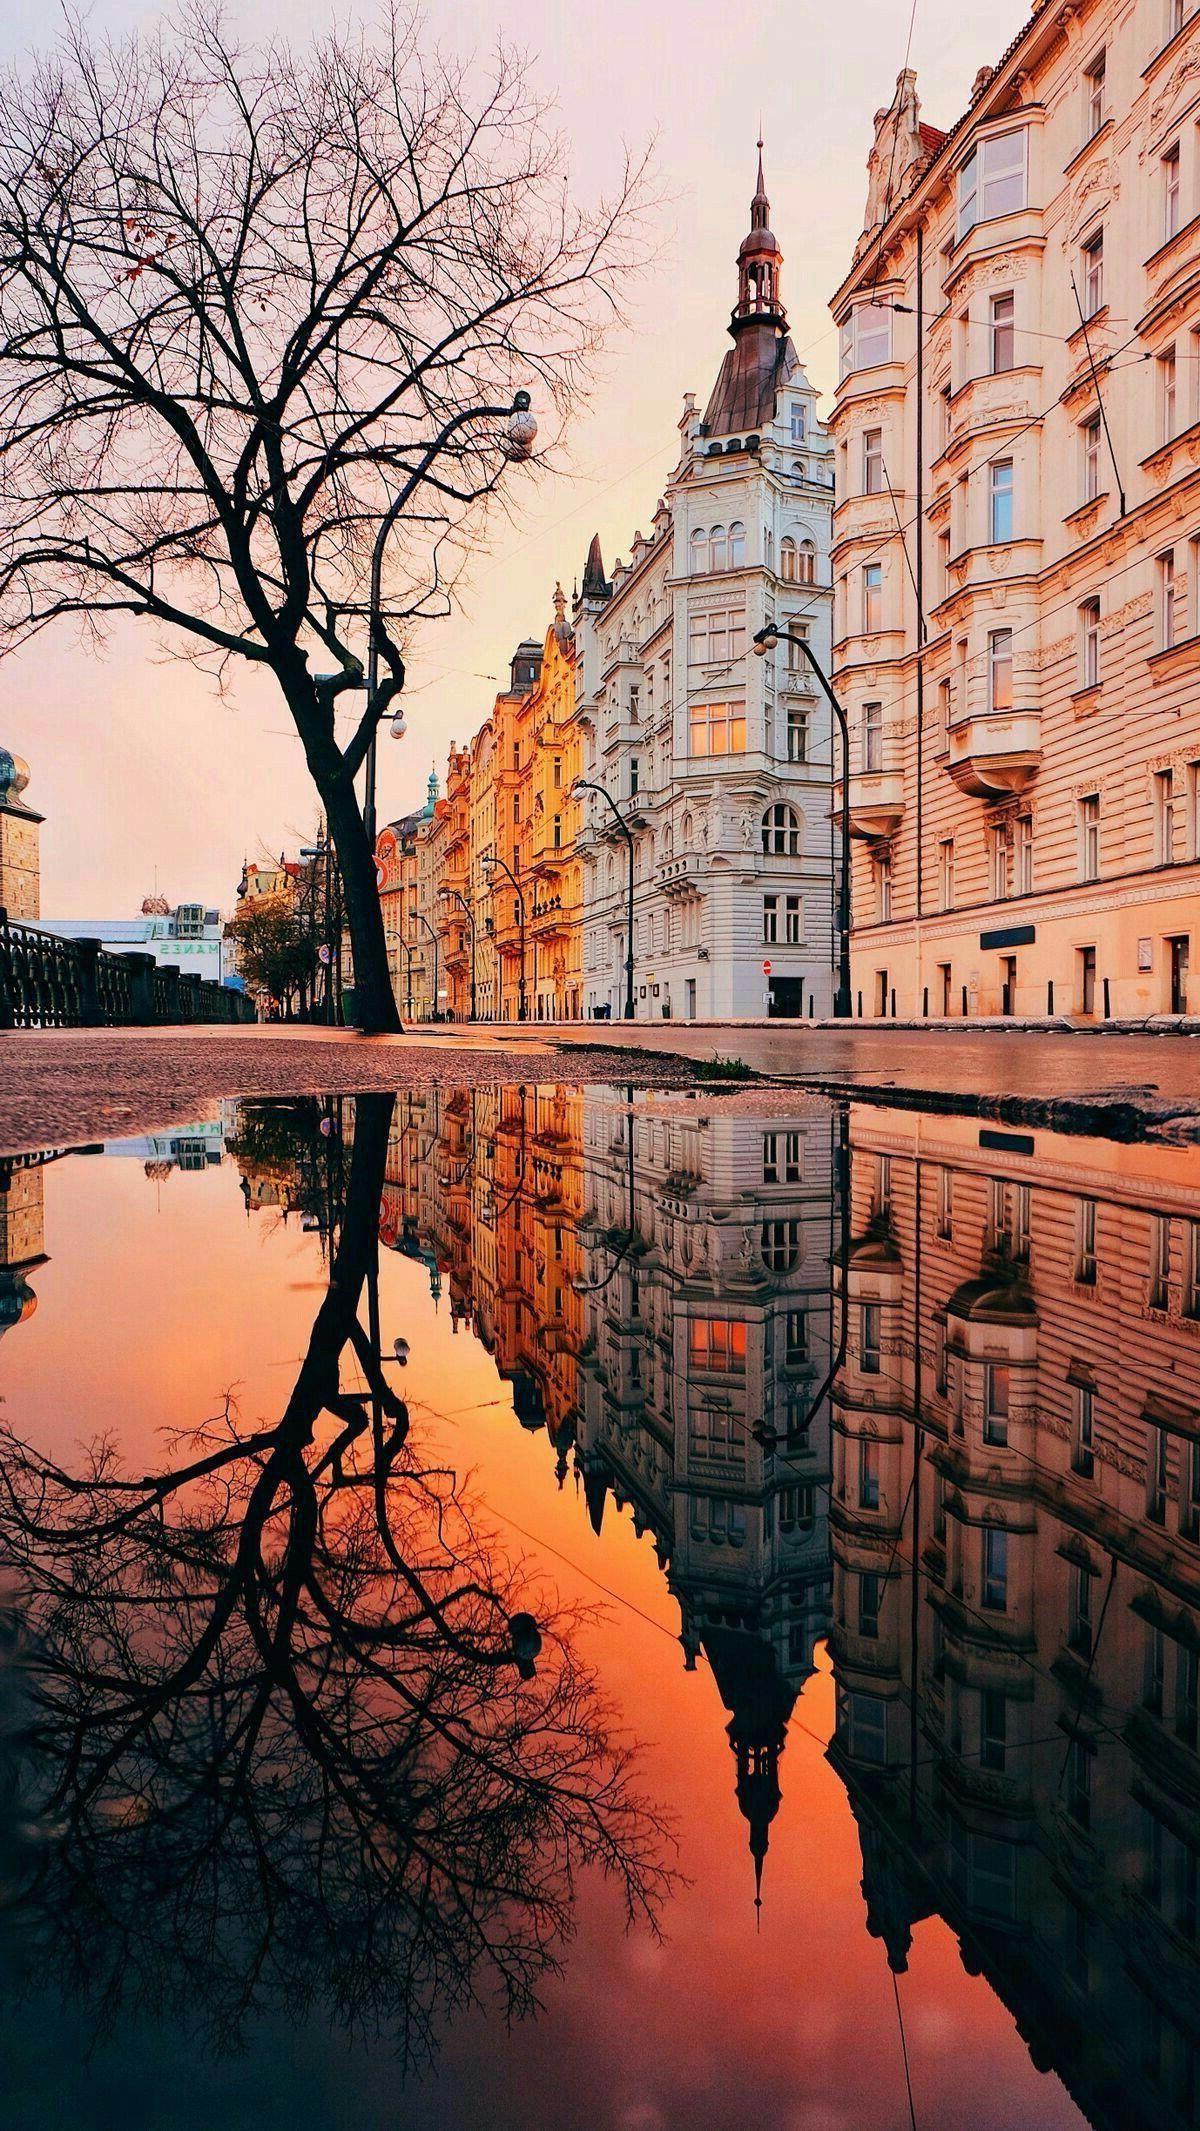 urban landscape photography LandscapePhotographyTips in